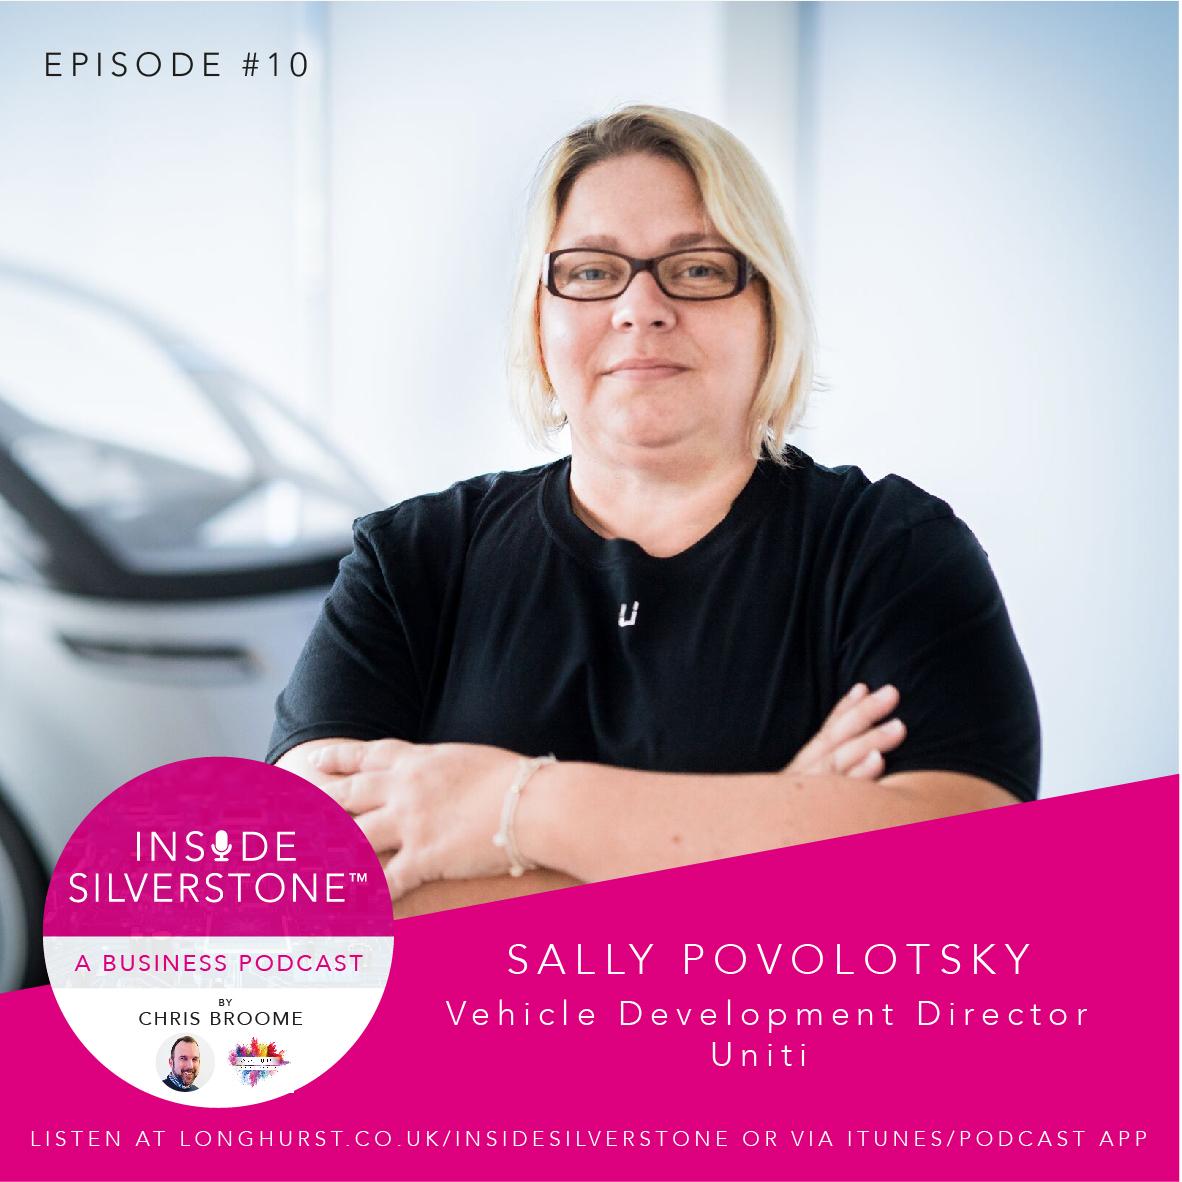 Sally Povolotsky - Vehicle Development Director at Uniti